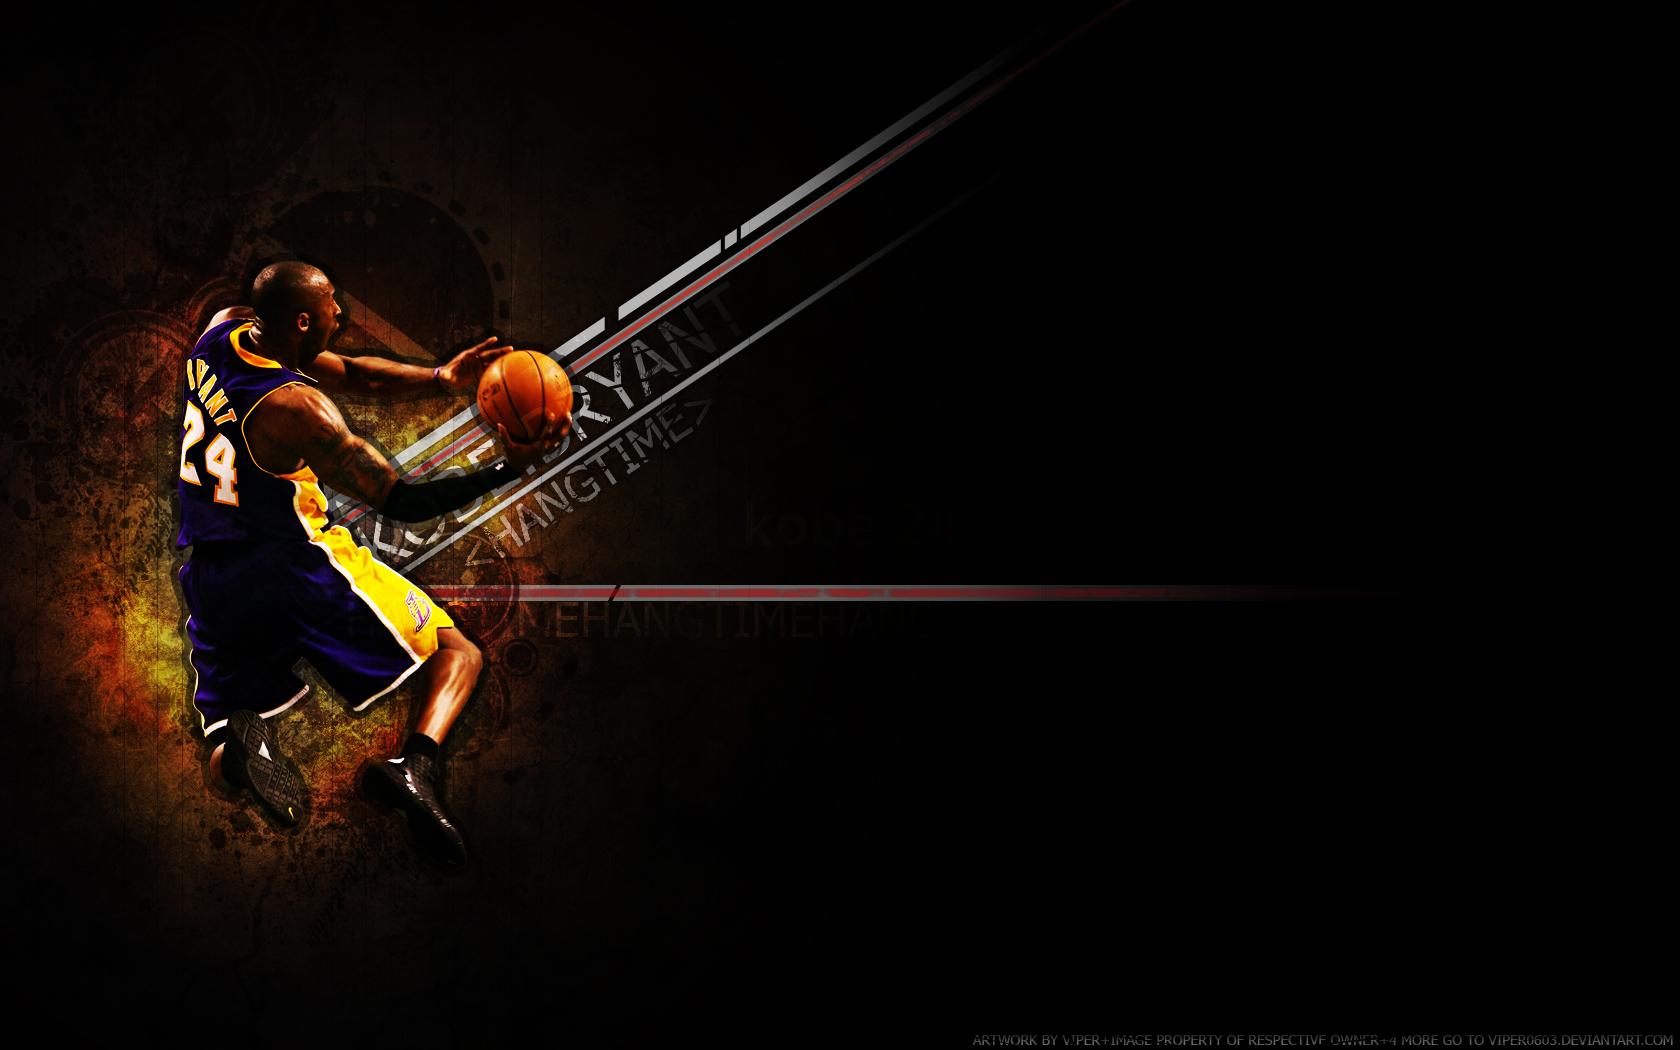 Basketball, фото, обои на рабочий стол, фото